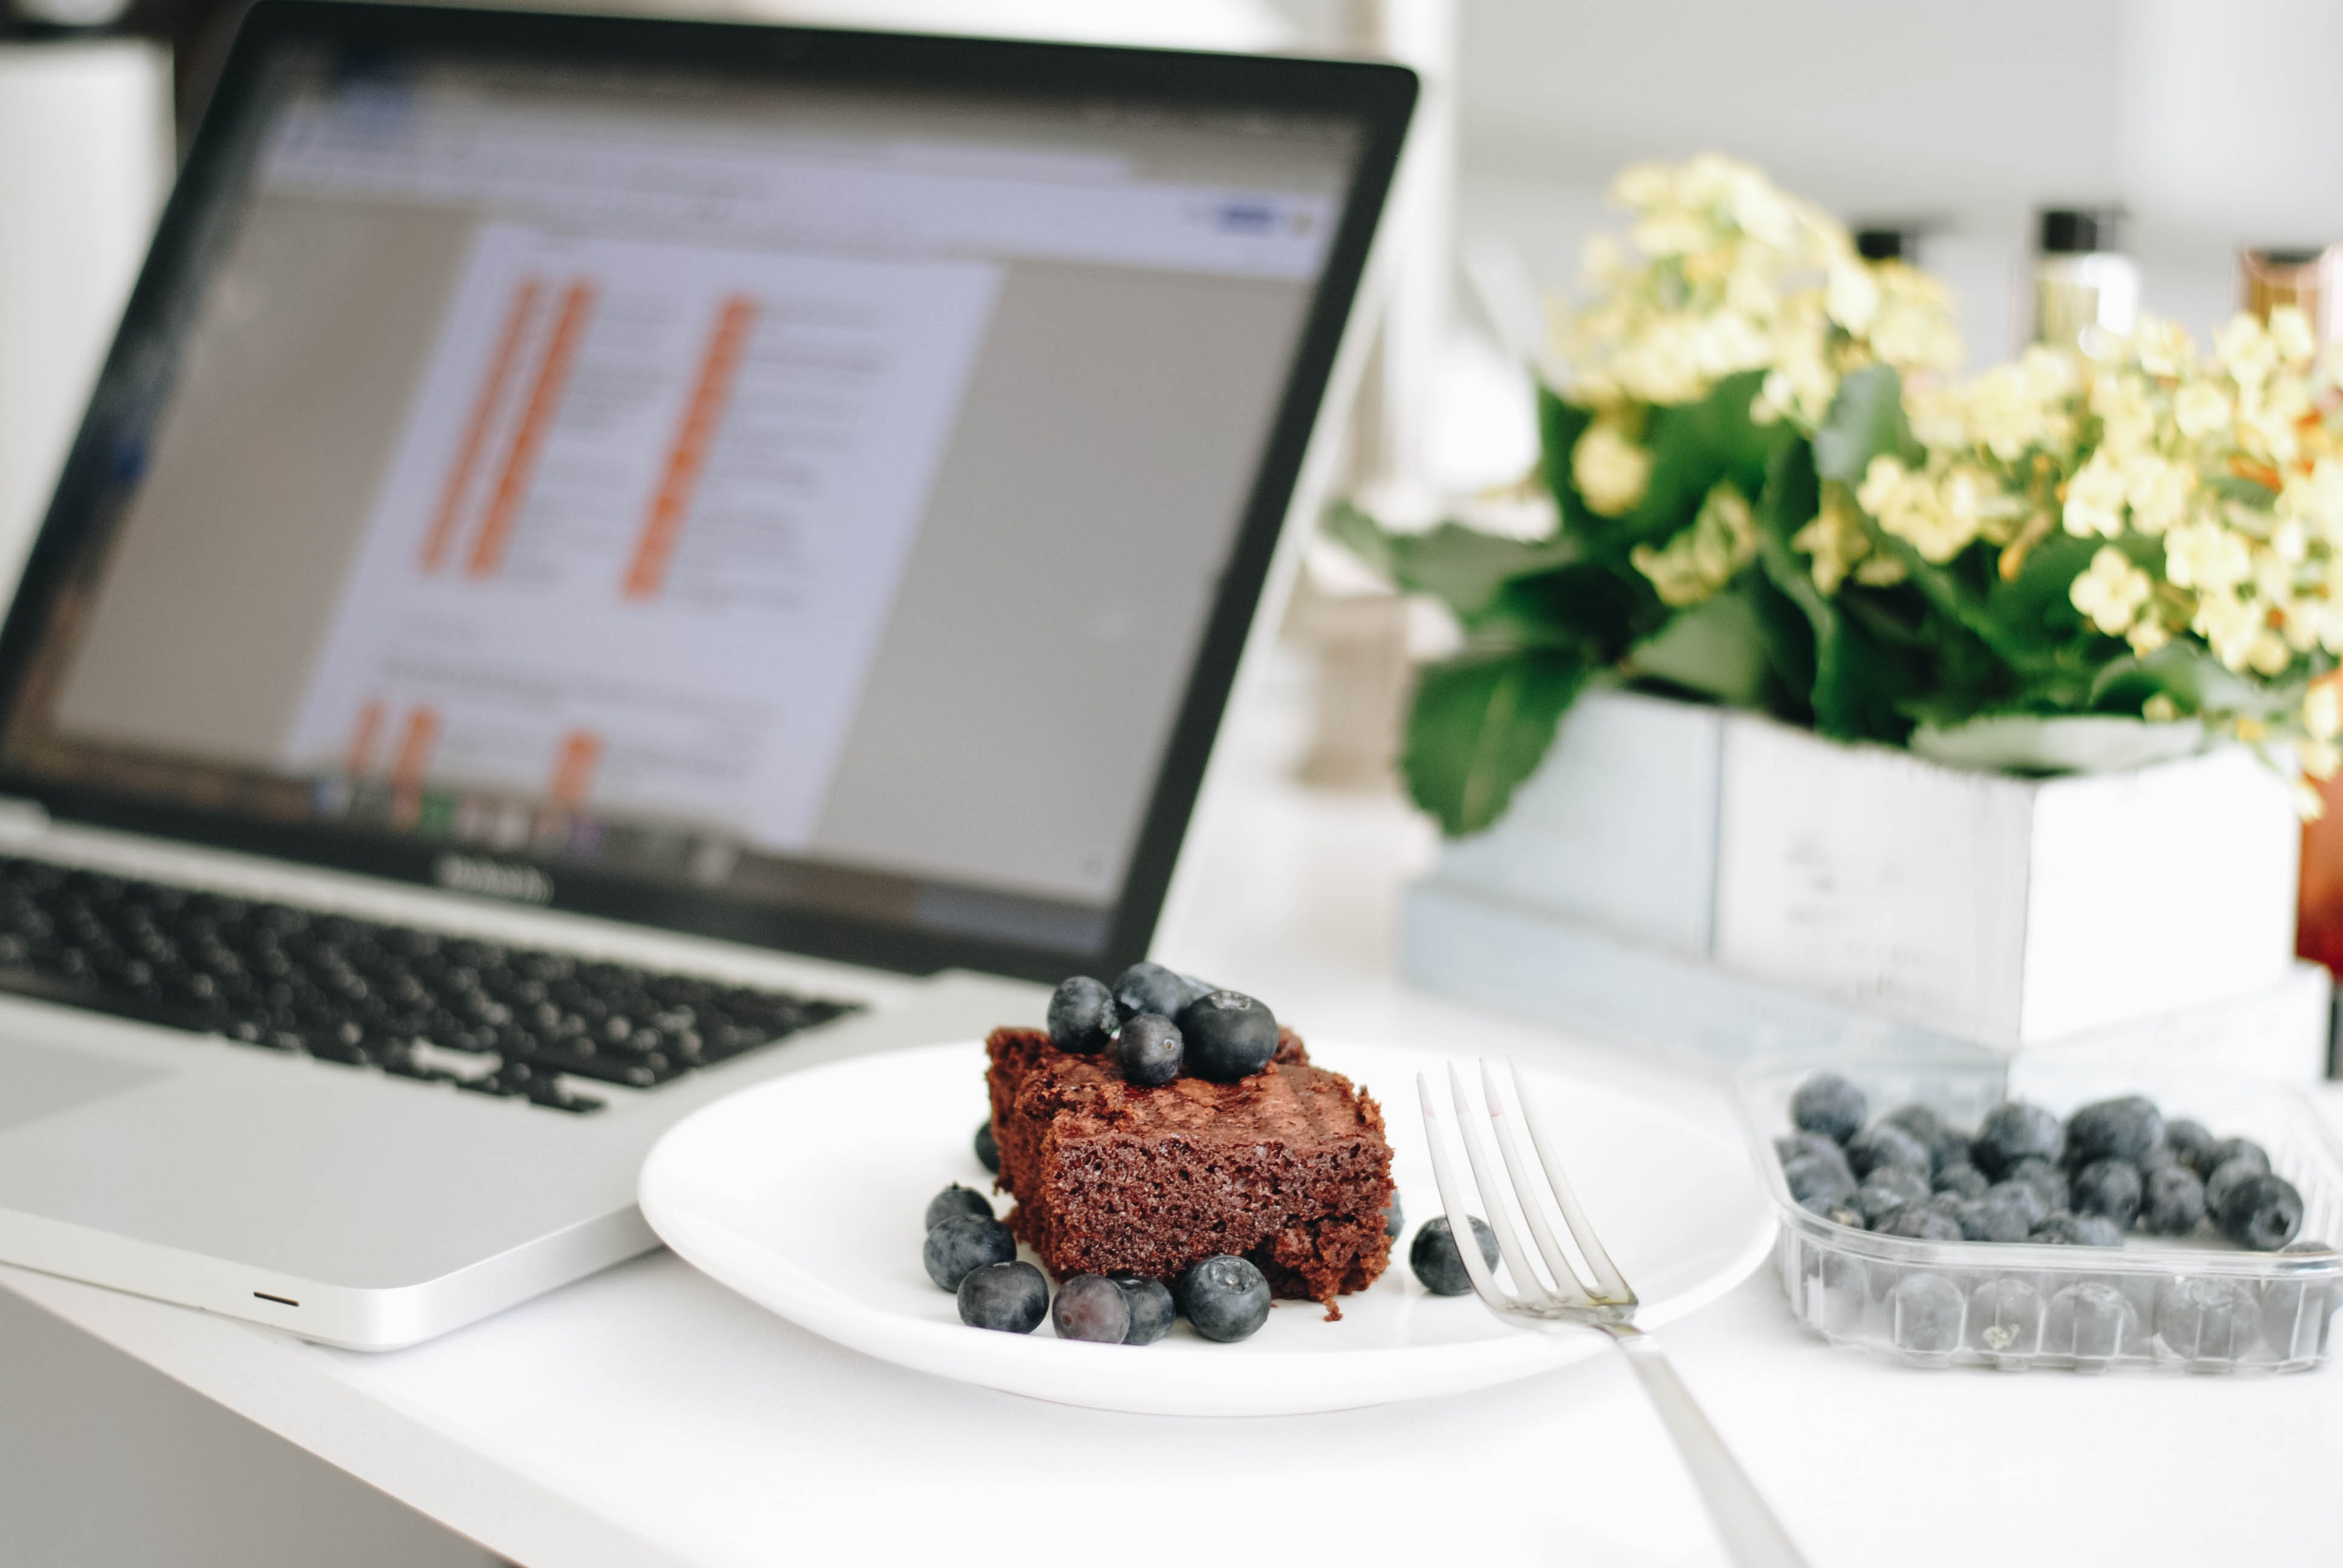 chocolate cake with berry fruit garnish